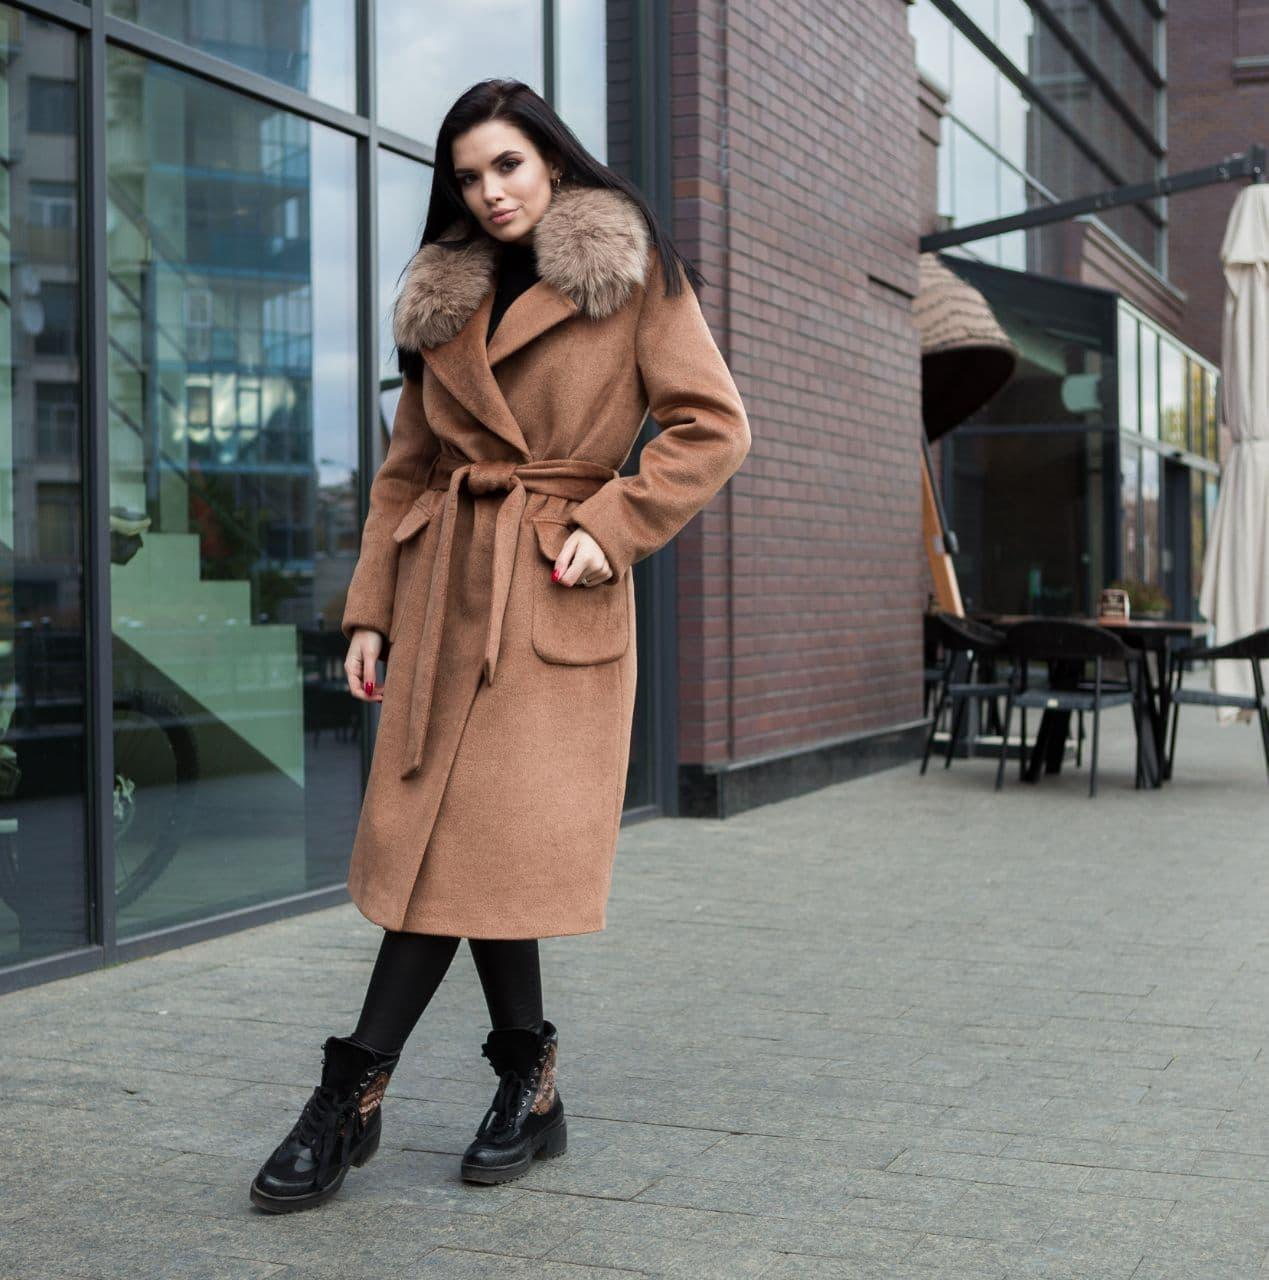 Пальто зимове жіноче коричневе з хутром